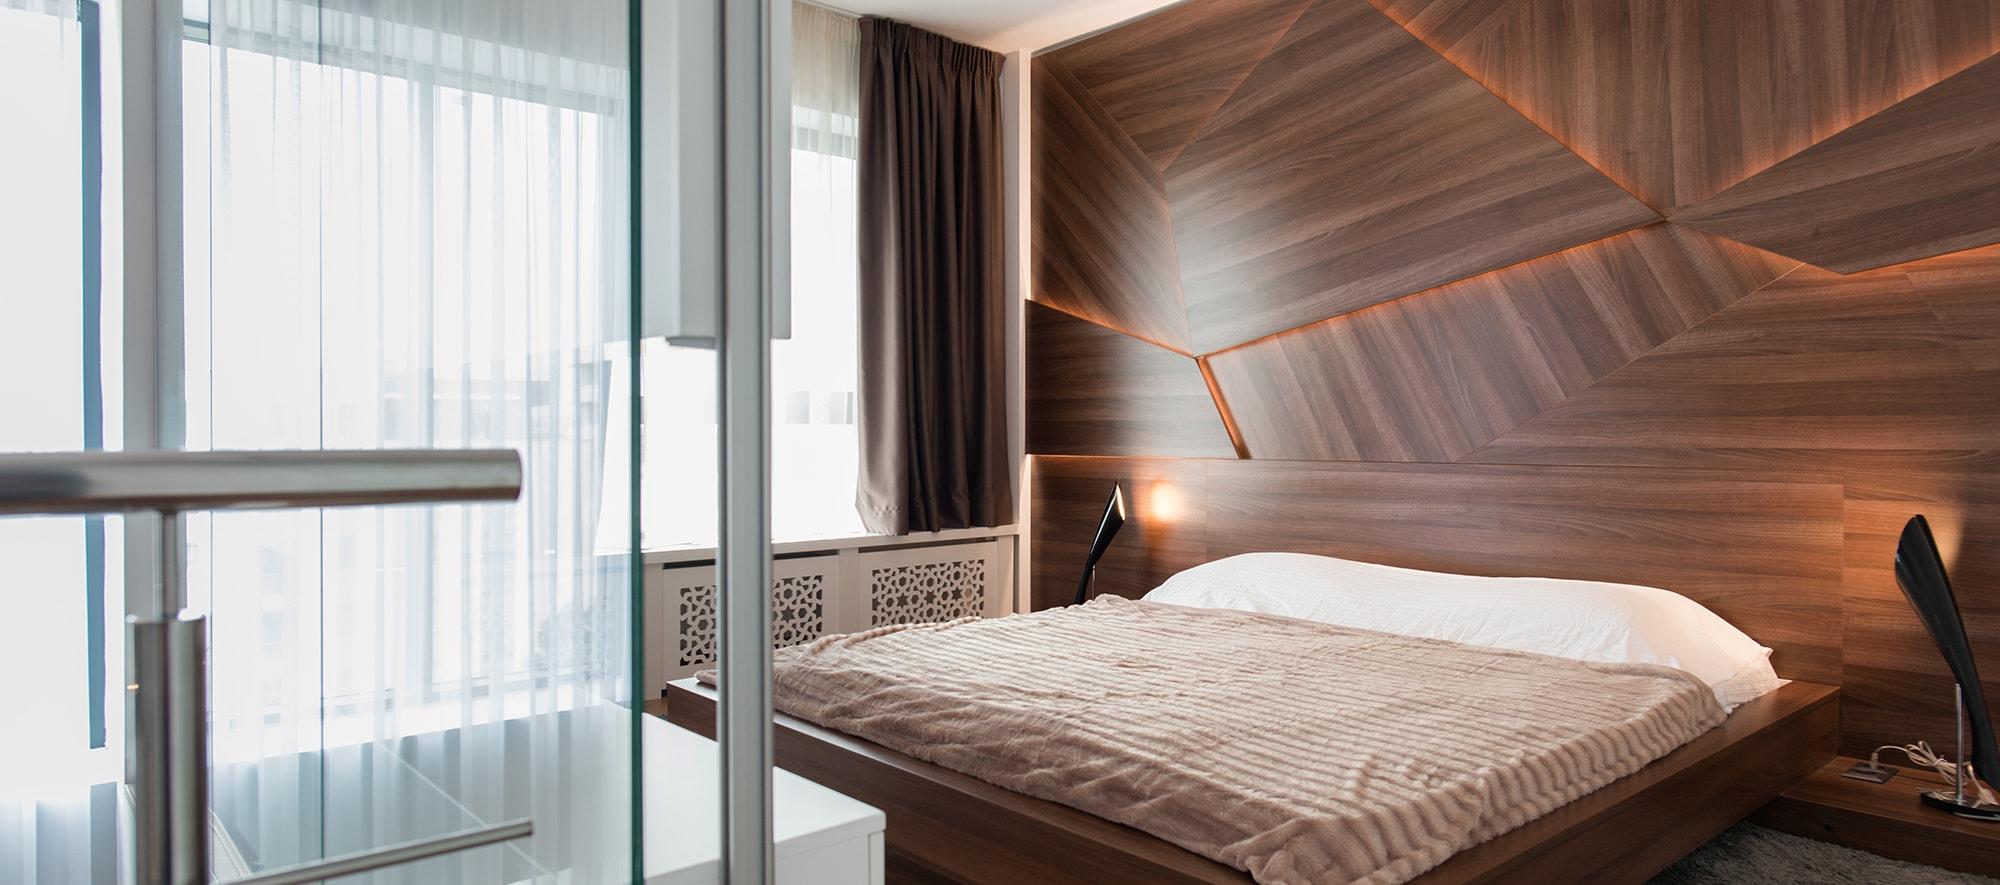 dormitor-a-slide-min